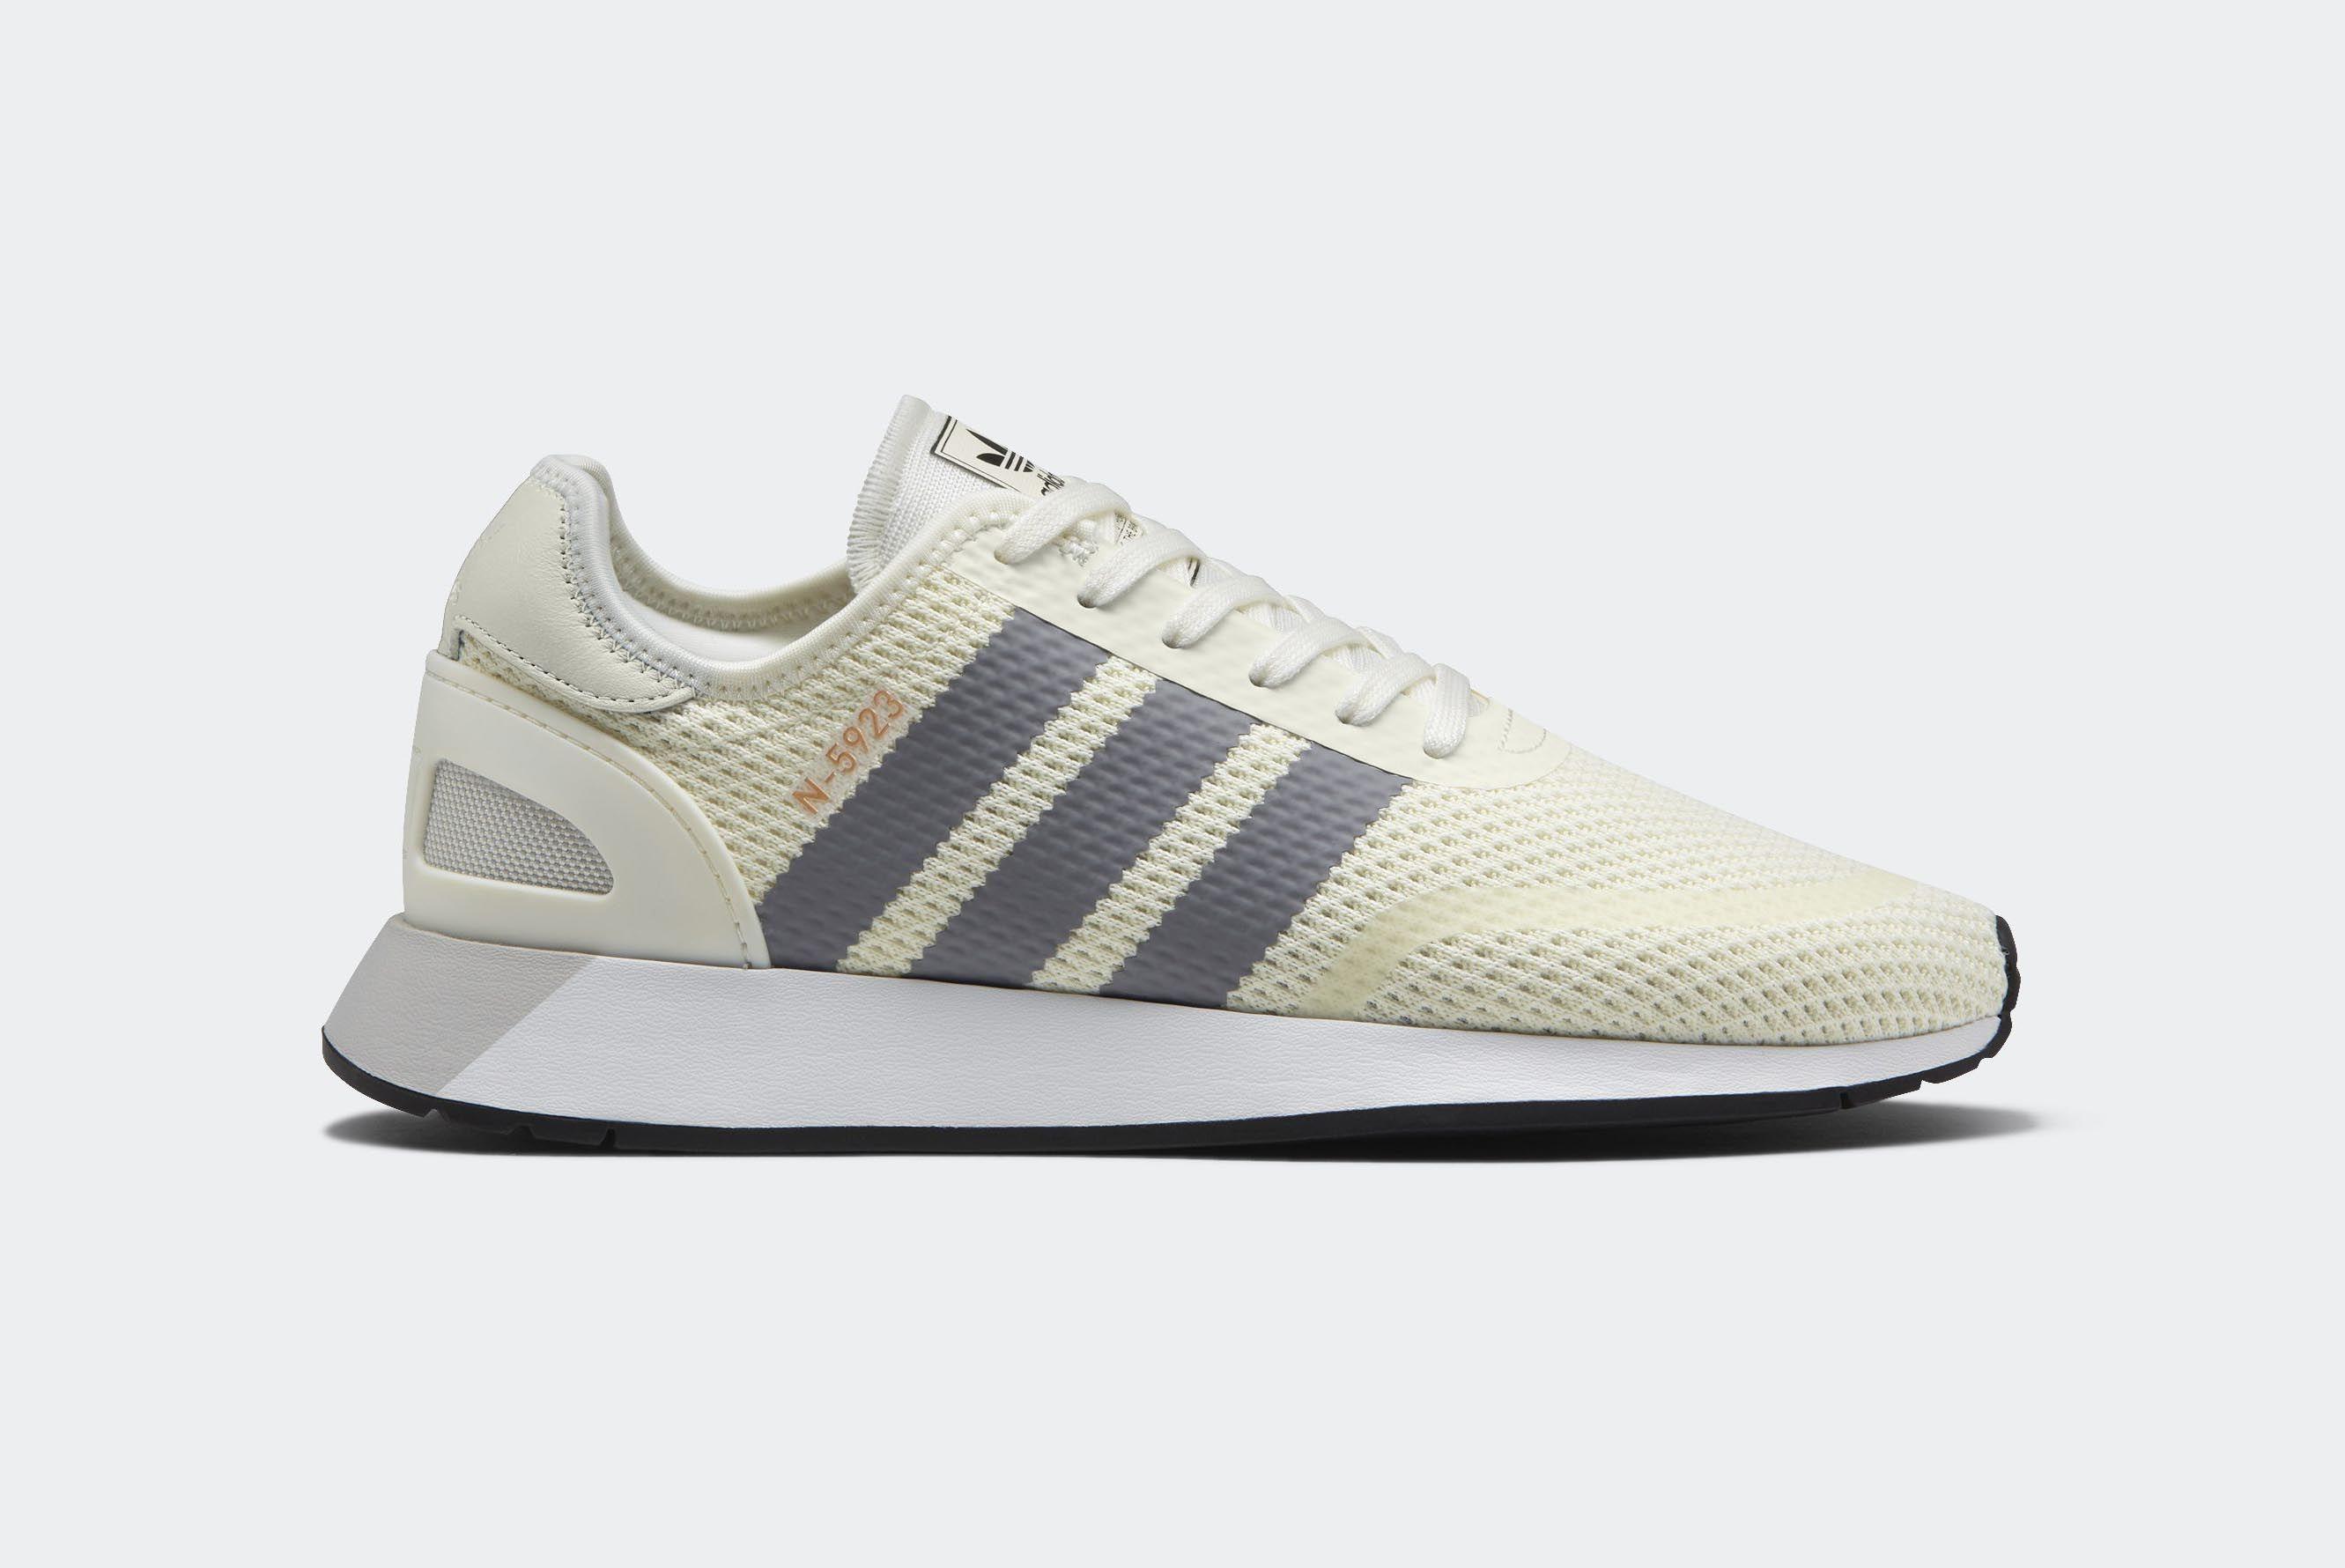 Adidas N 5923 E1521479298265 Sneaker Freaker